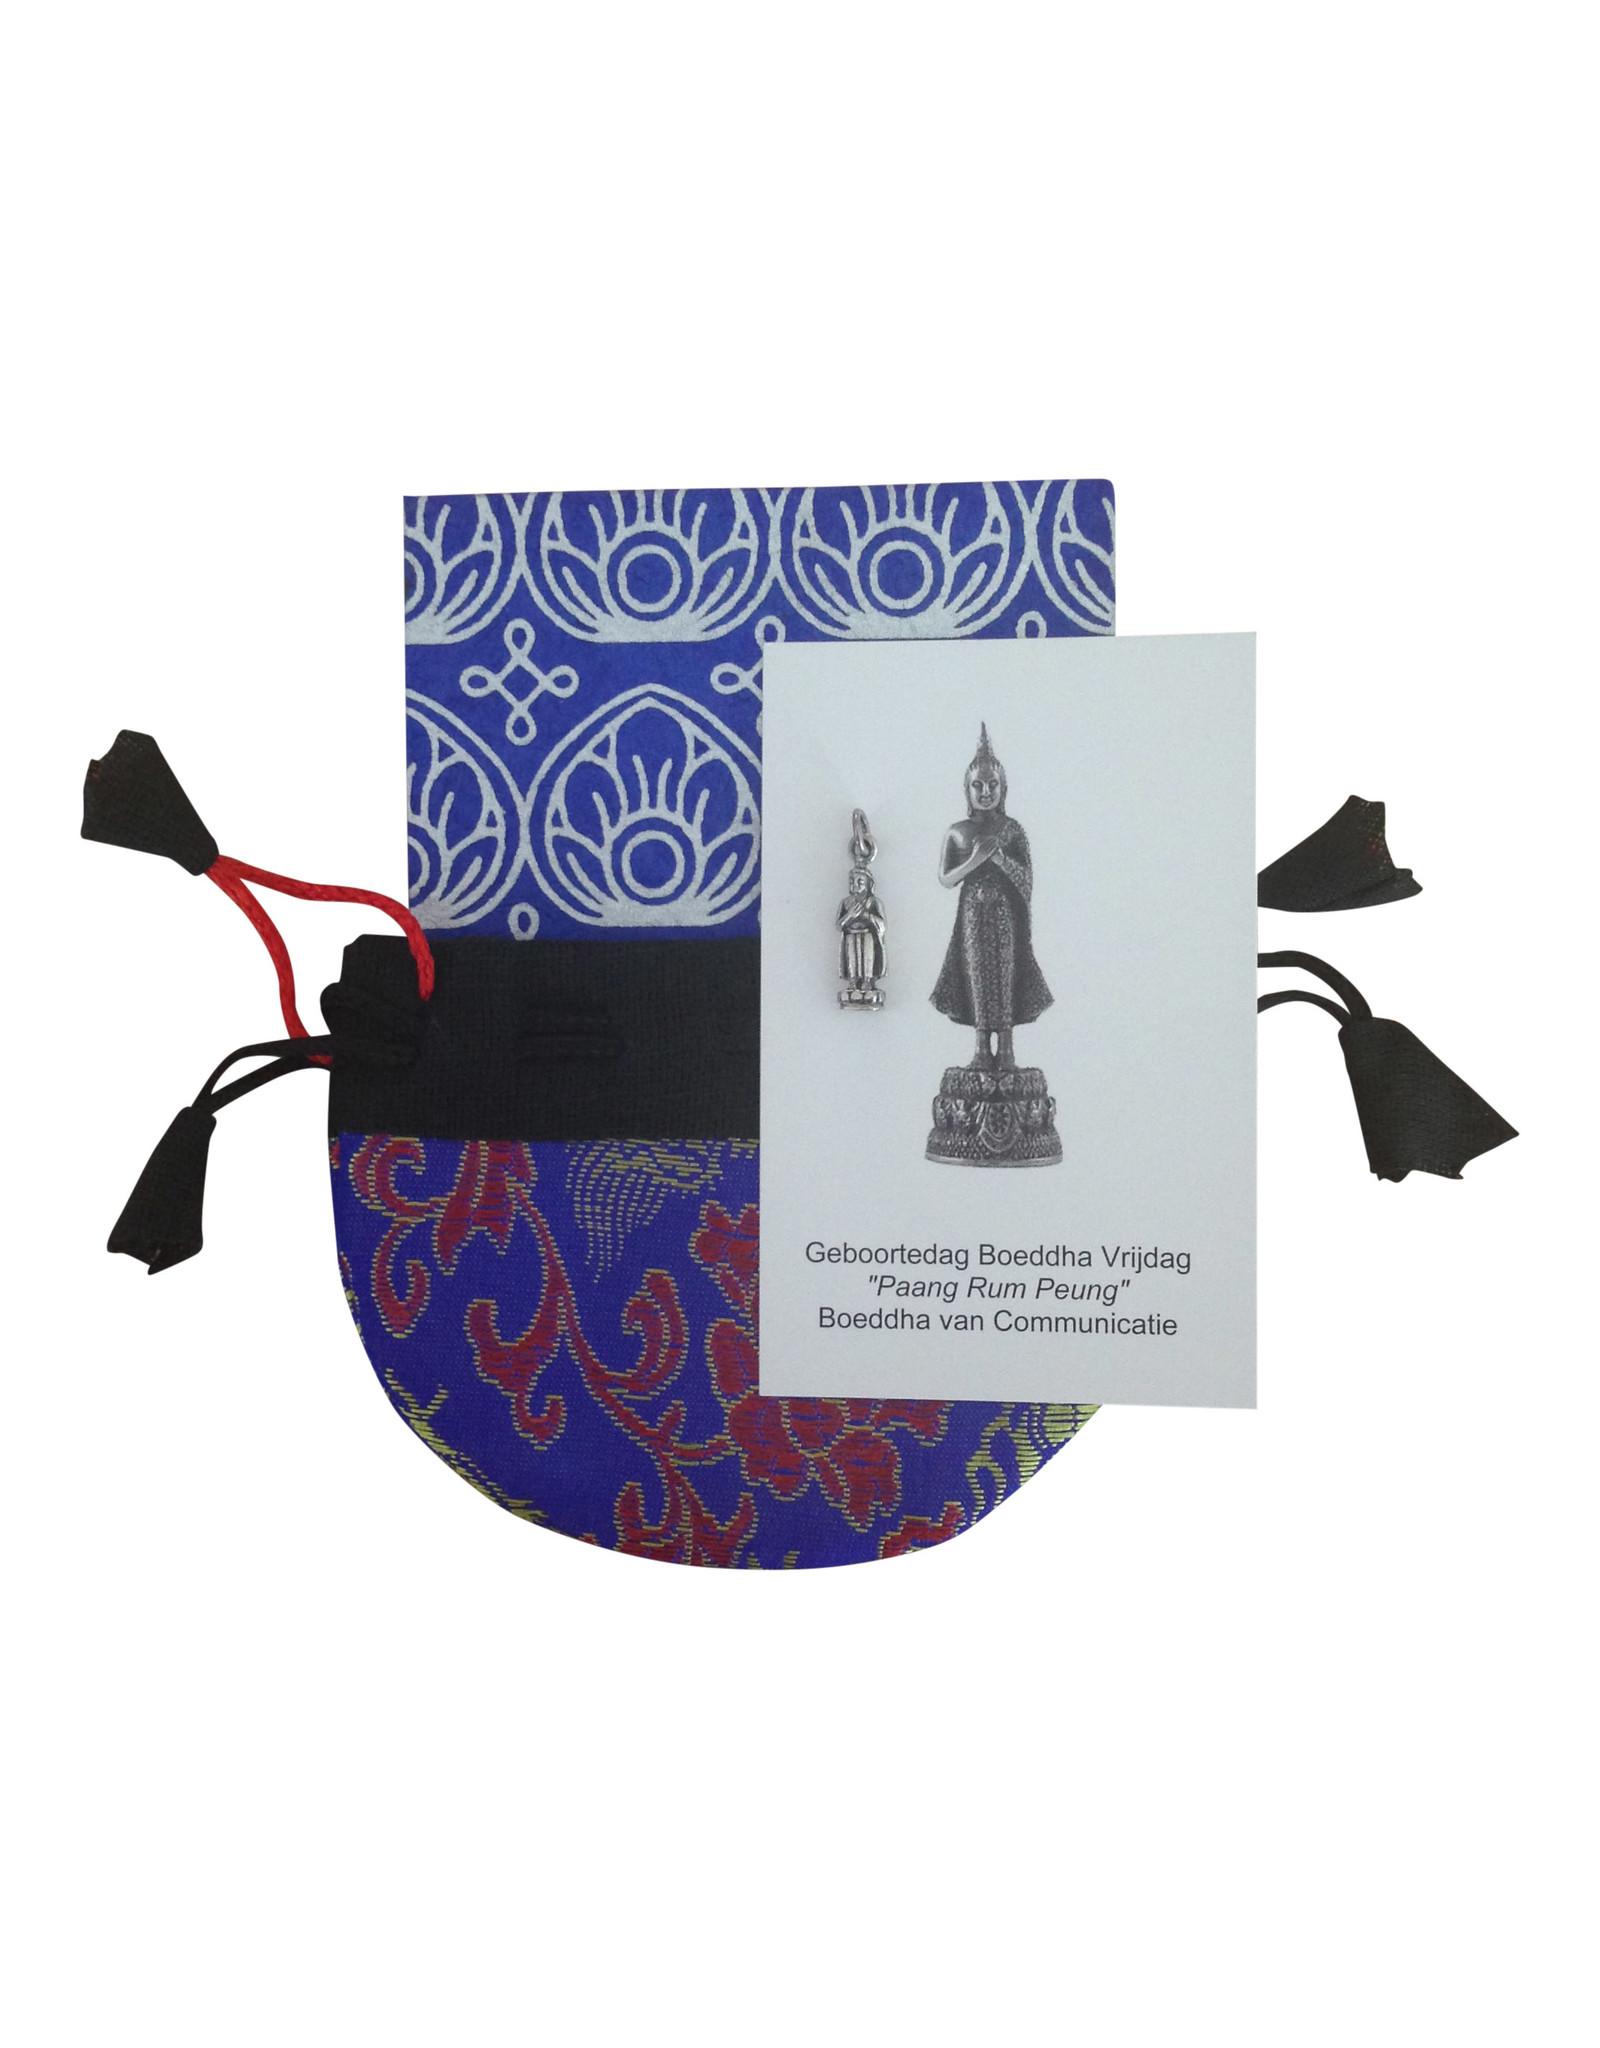 Dakini hanger geboortedag Boeddha vrijdag